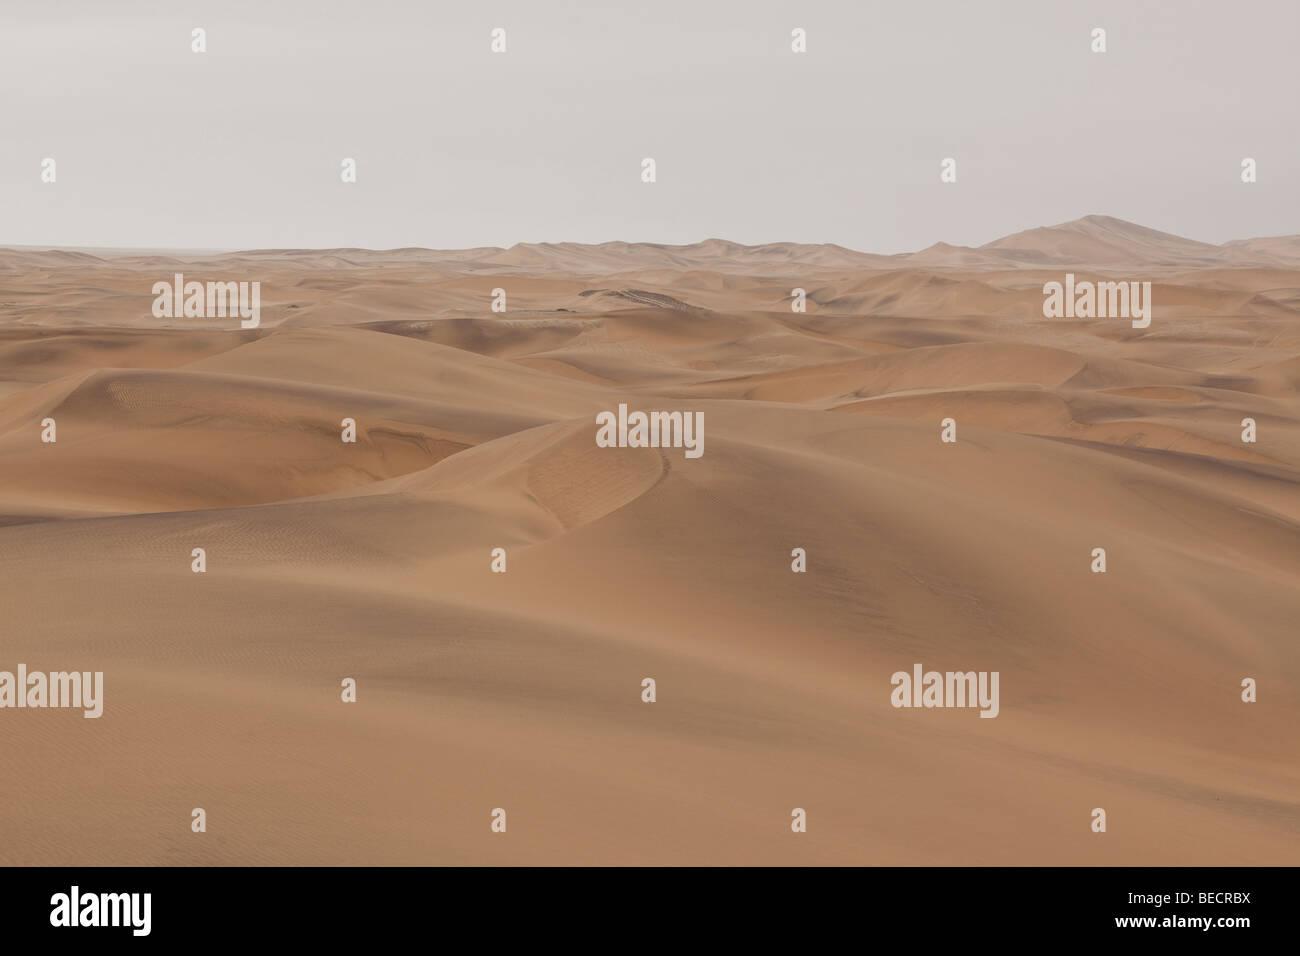 Sand dunes near Swakopmund, Namib Desert, Namibia, Africa - Stock Image